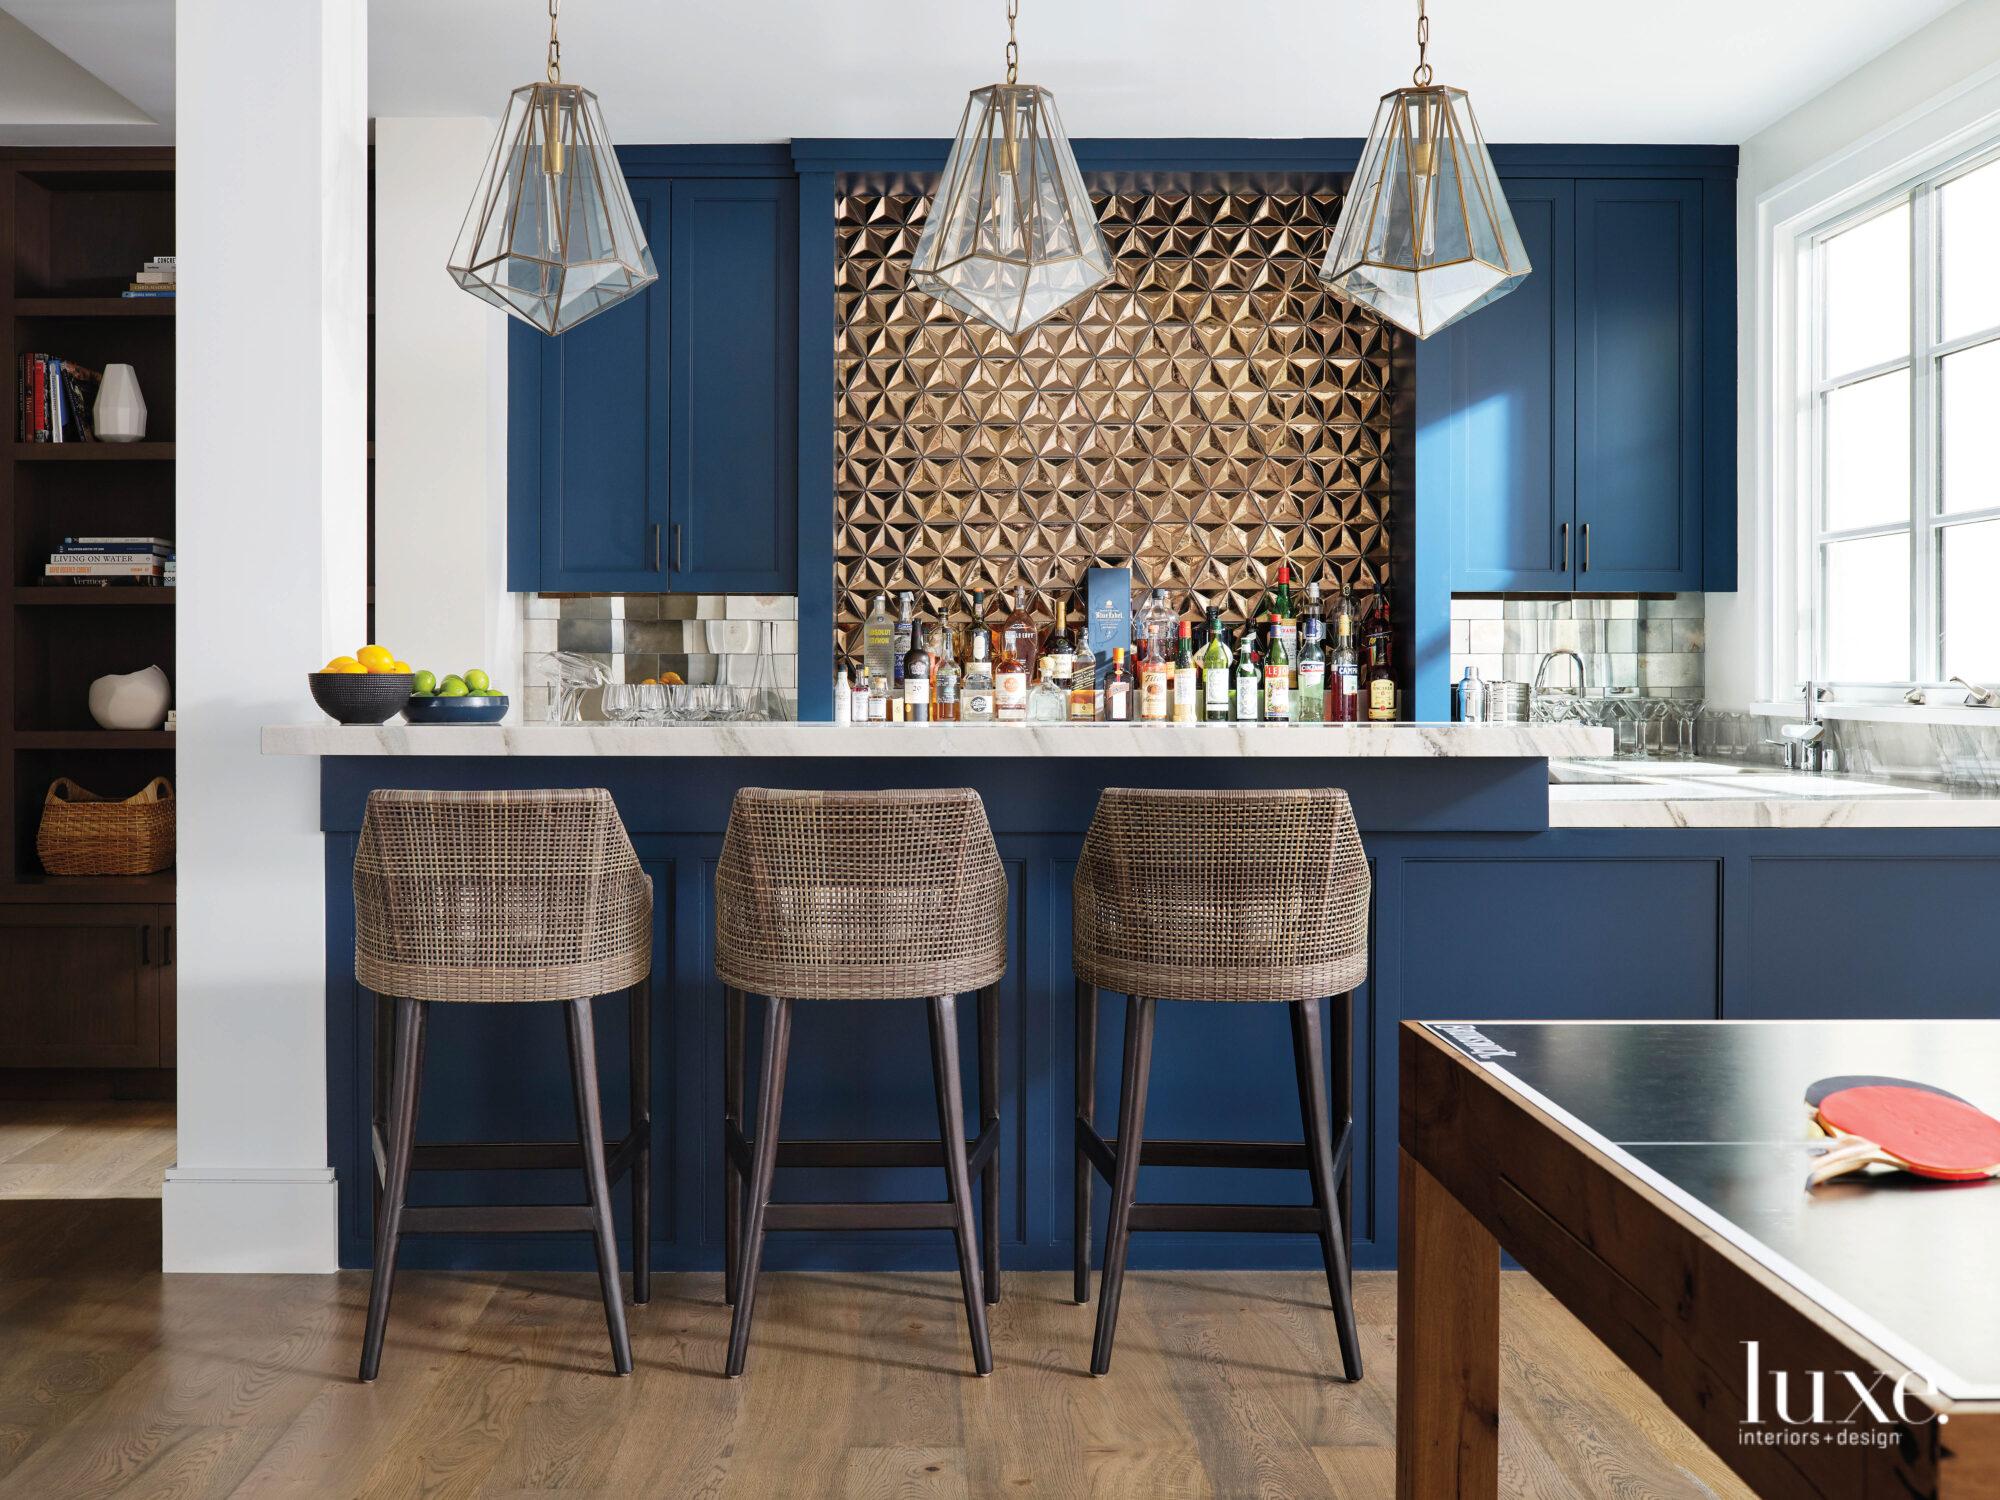 A row of bar stools...